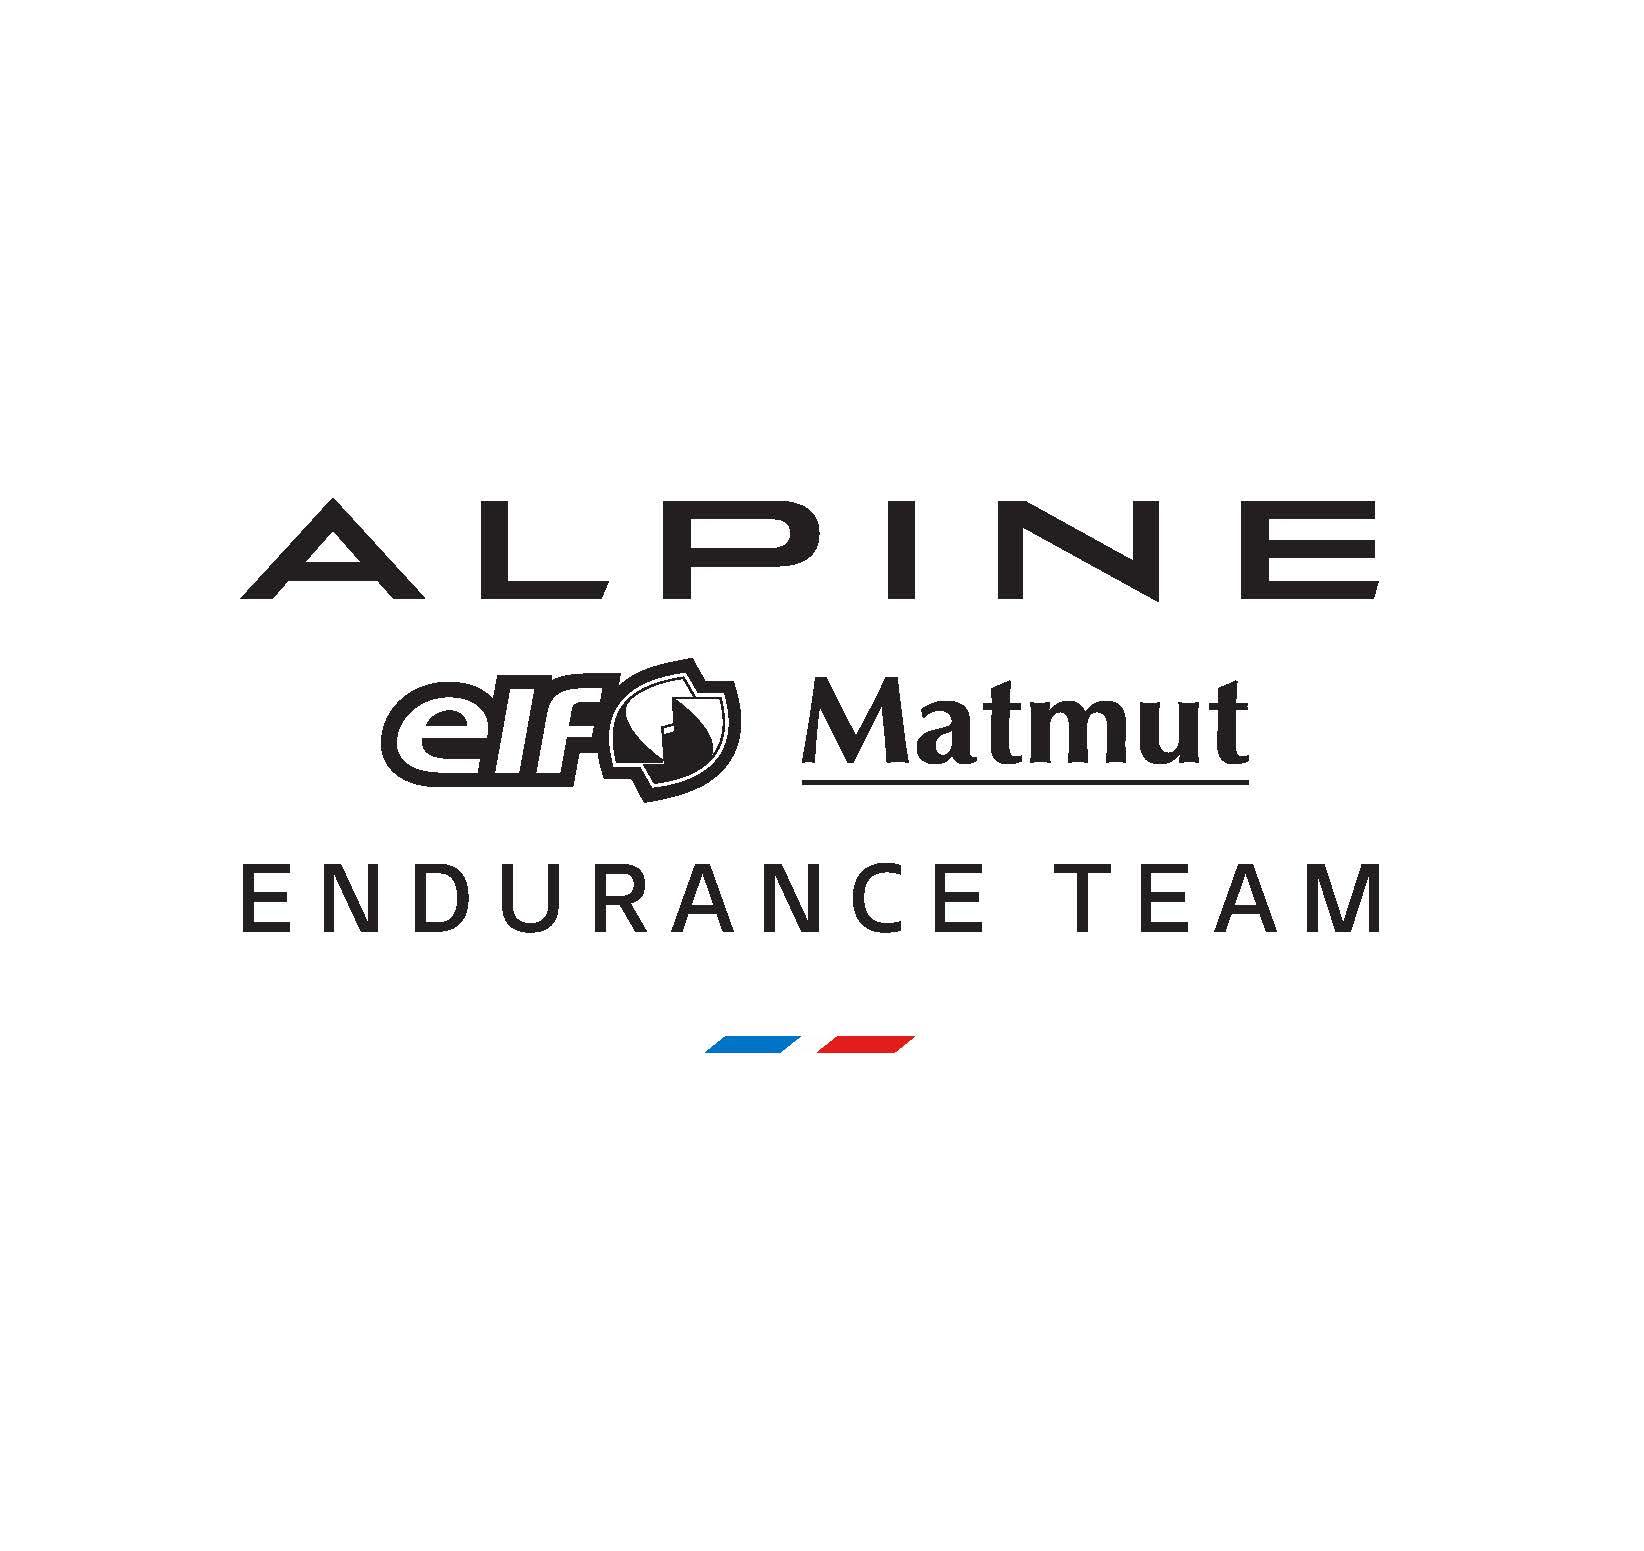 ALPINE ELF MATMUT